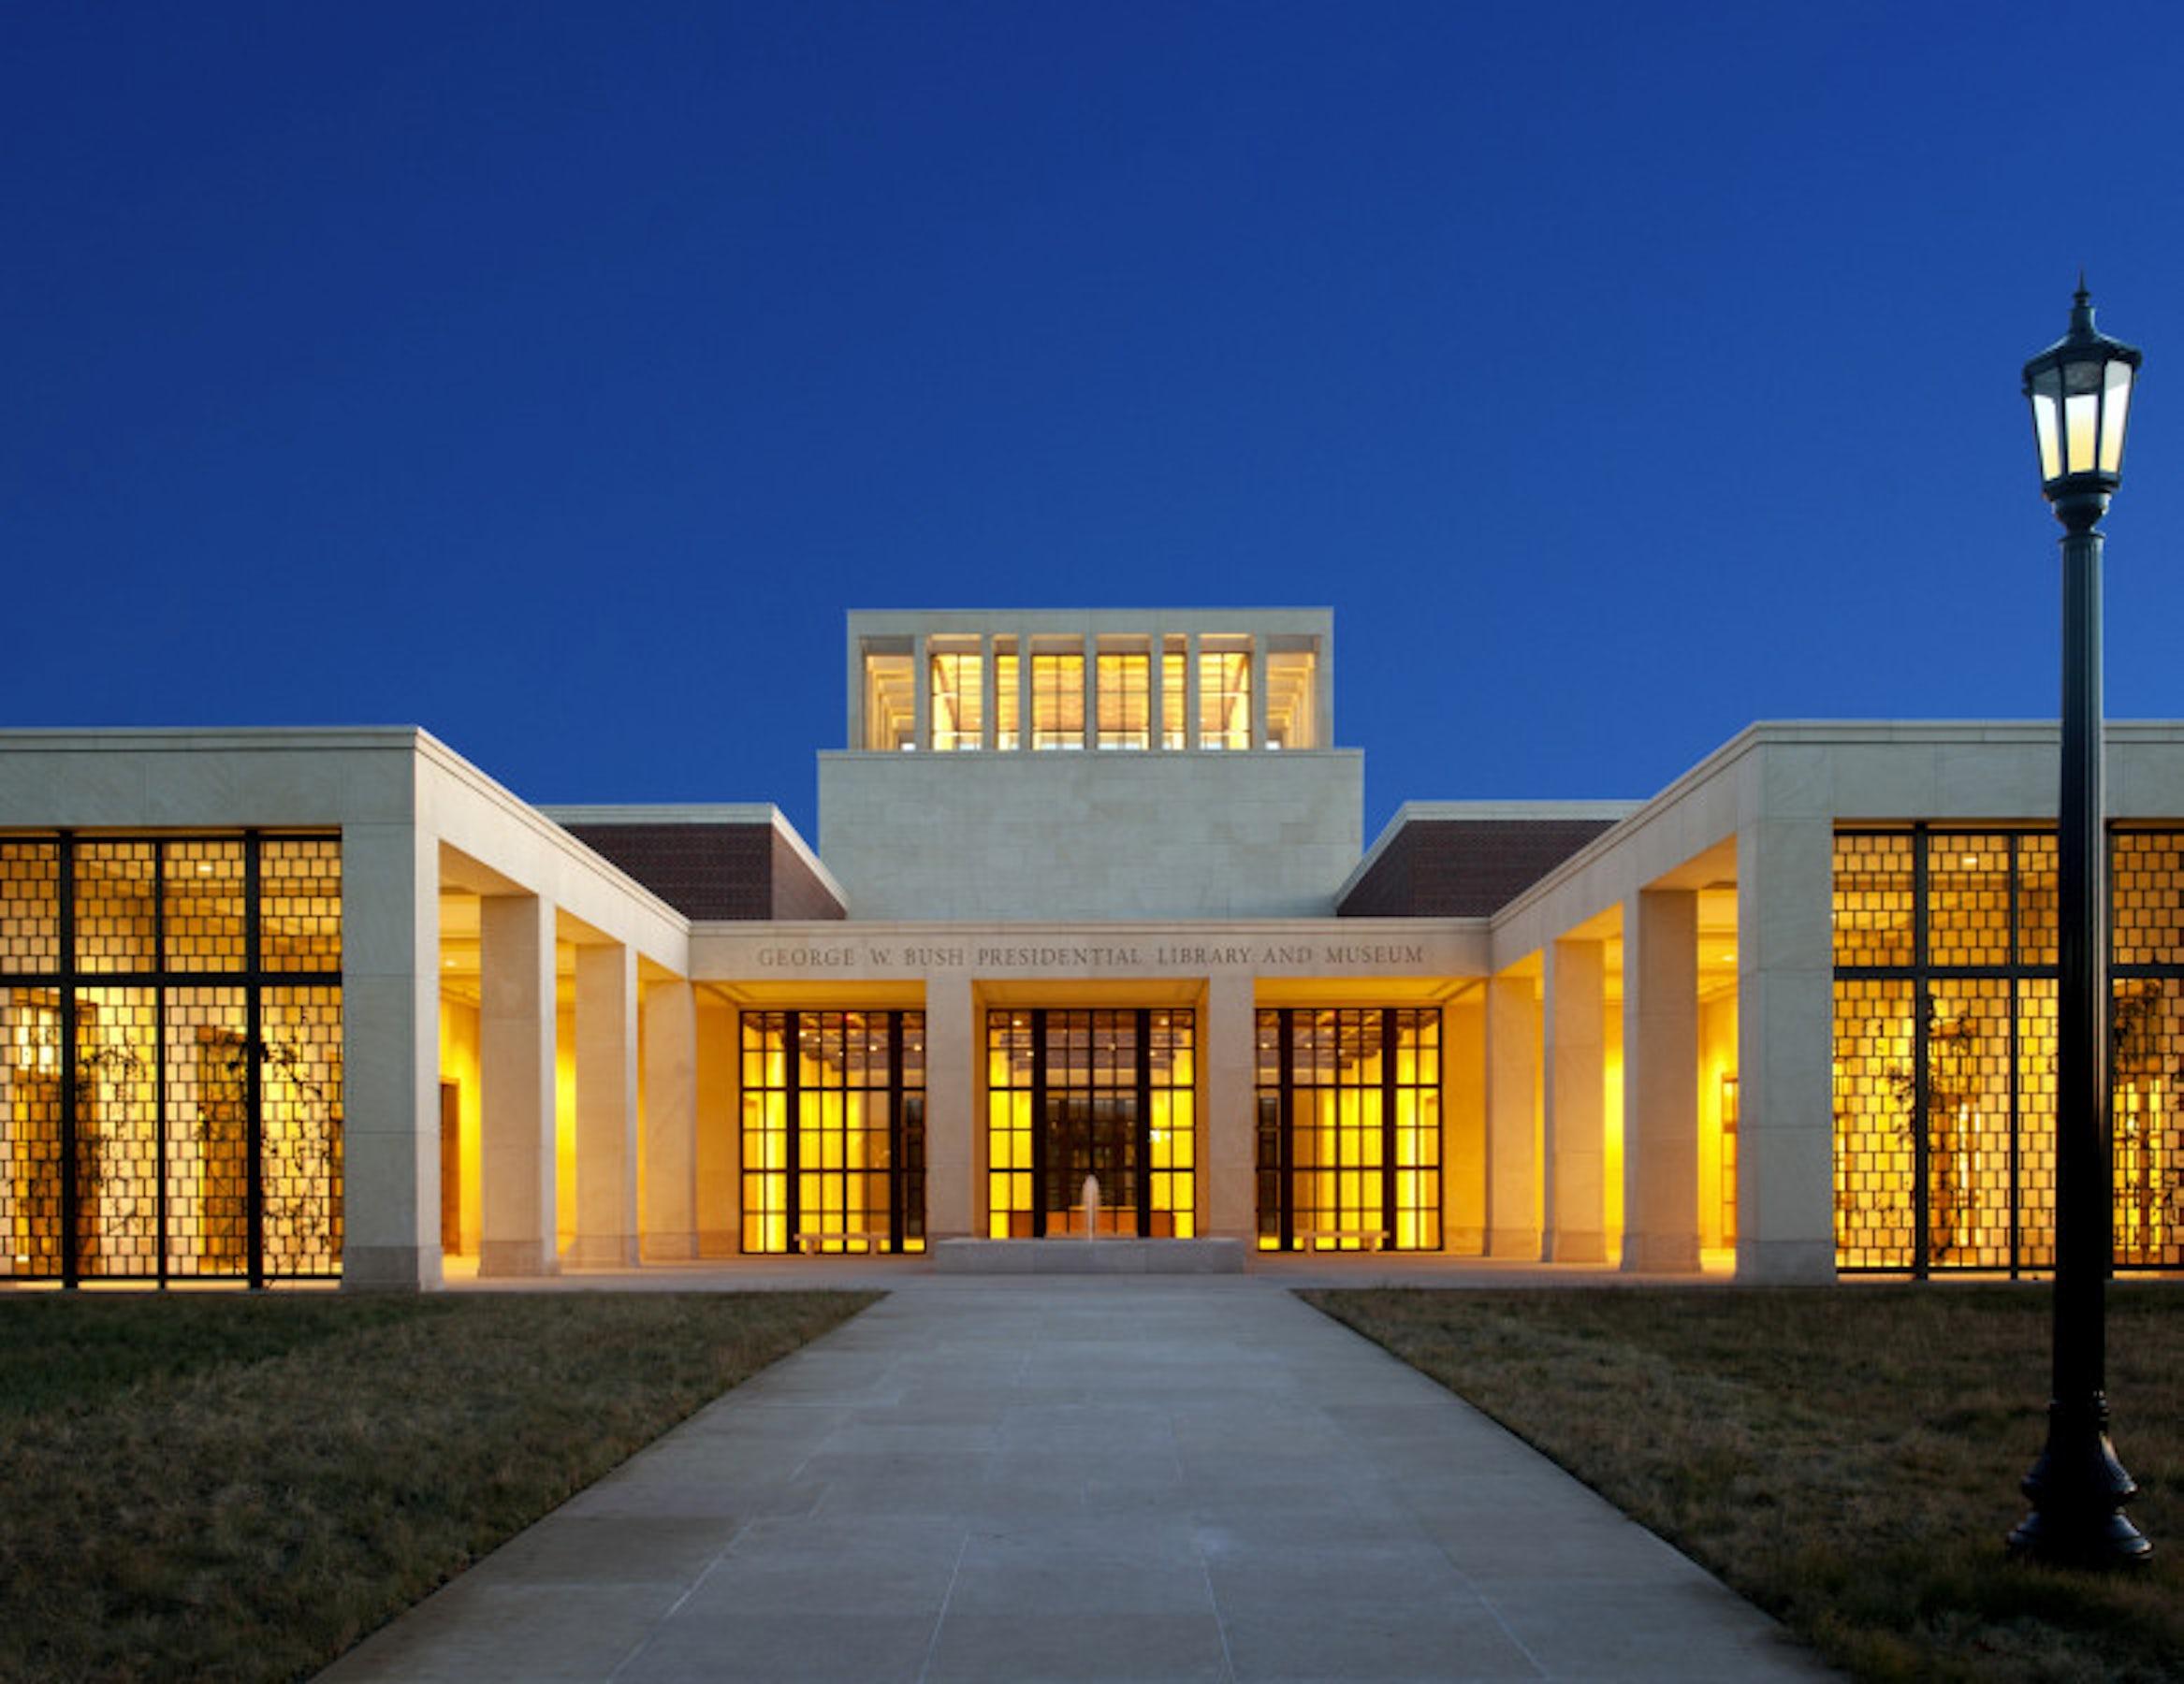 George W. Bush Presidential Center in Beyond Dallas